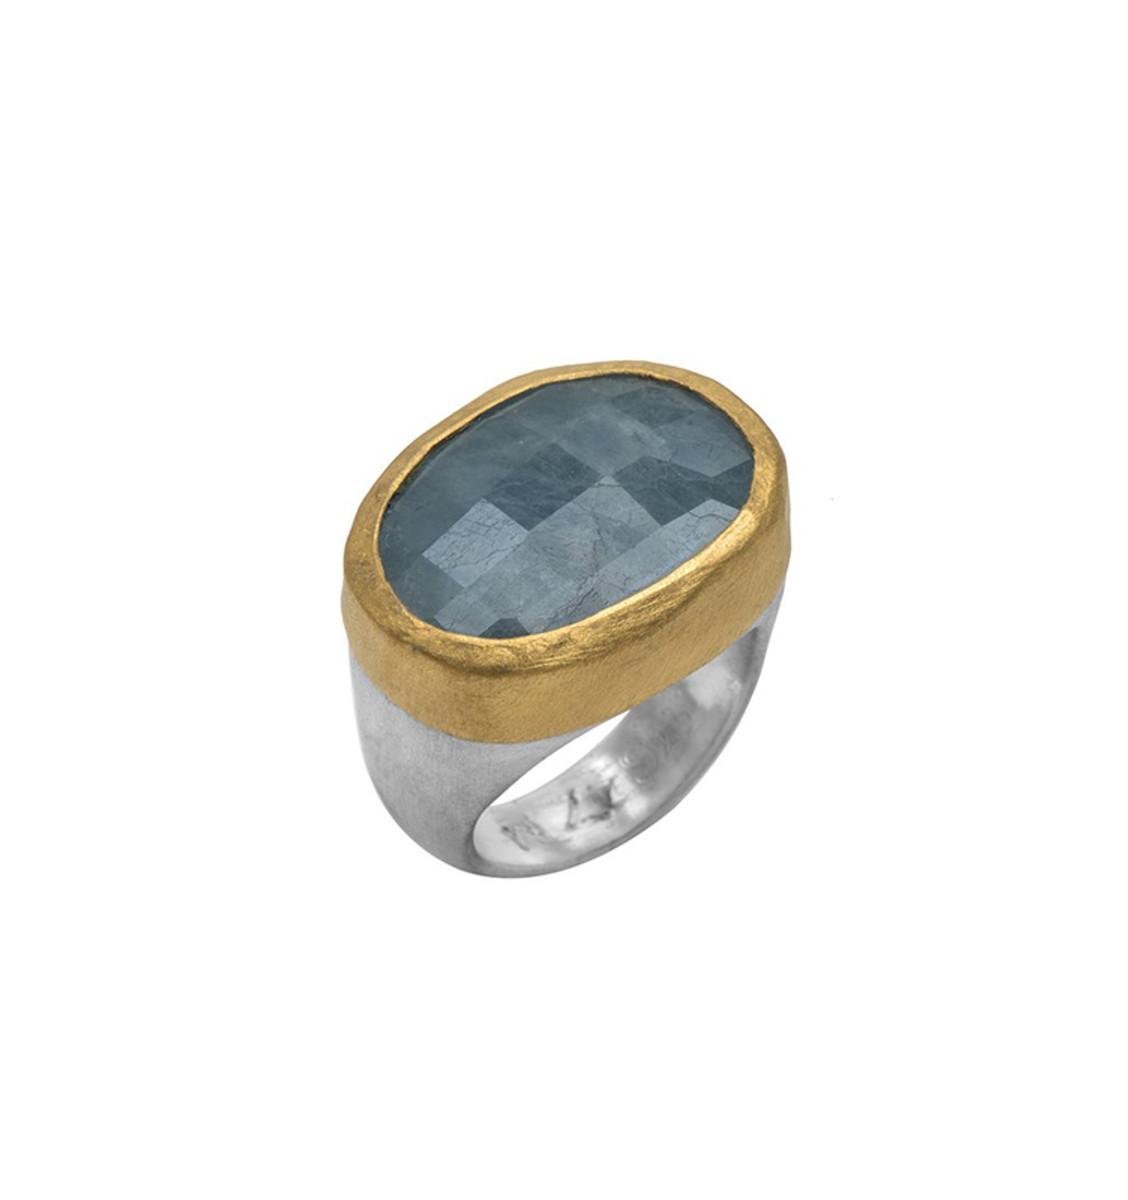 Oprahs Aquamarine Ring by Nava Zahavi - New Arrival